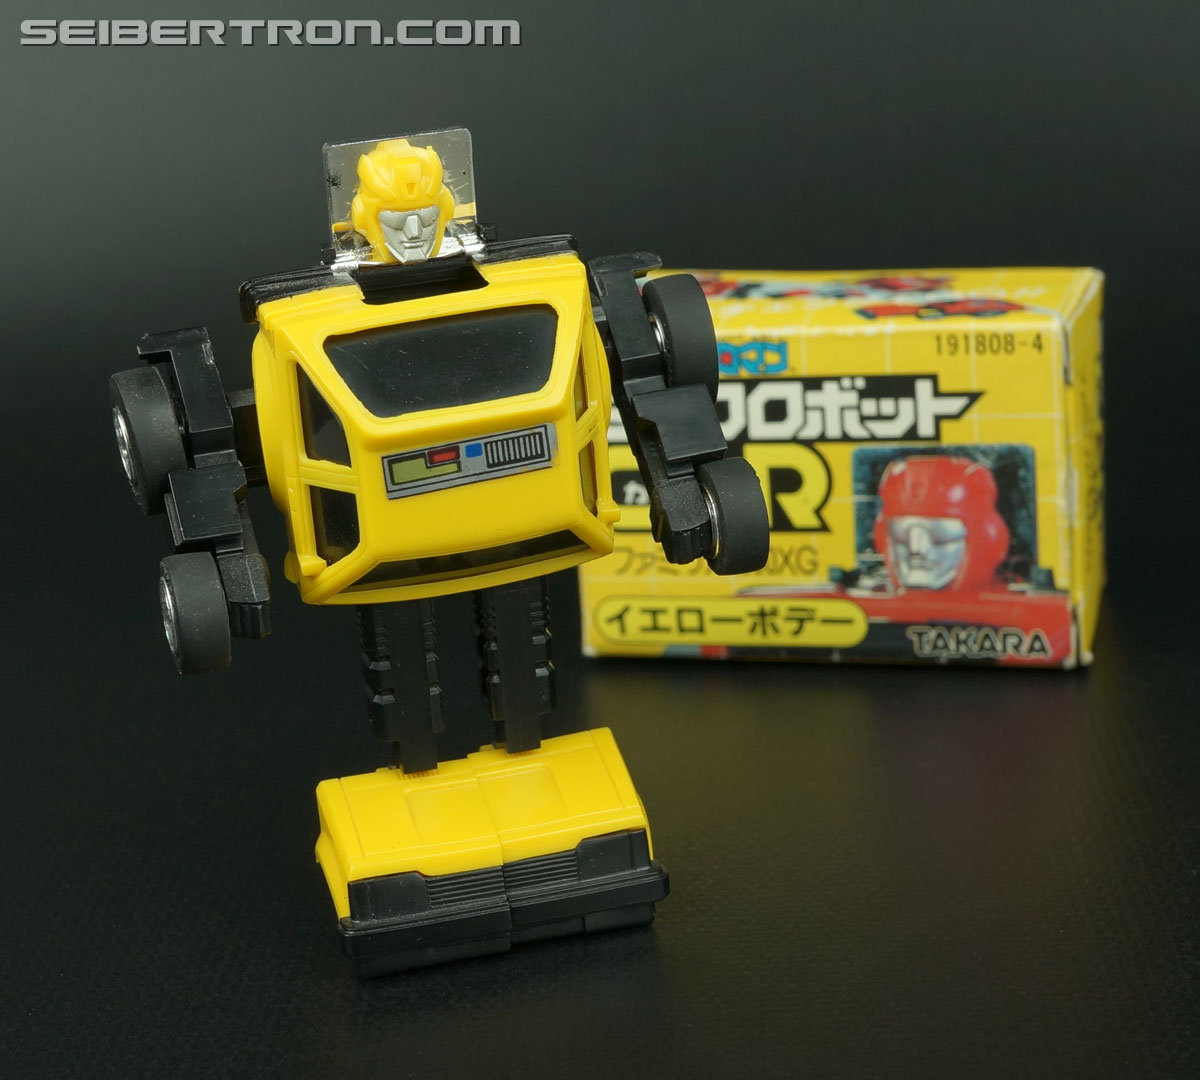 Transformers Micro Change MC04 Mini CAR Robo 02 XG1500 (Yellow) (Image #69 of 70)